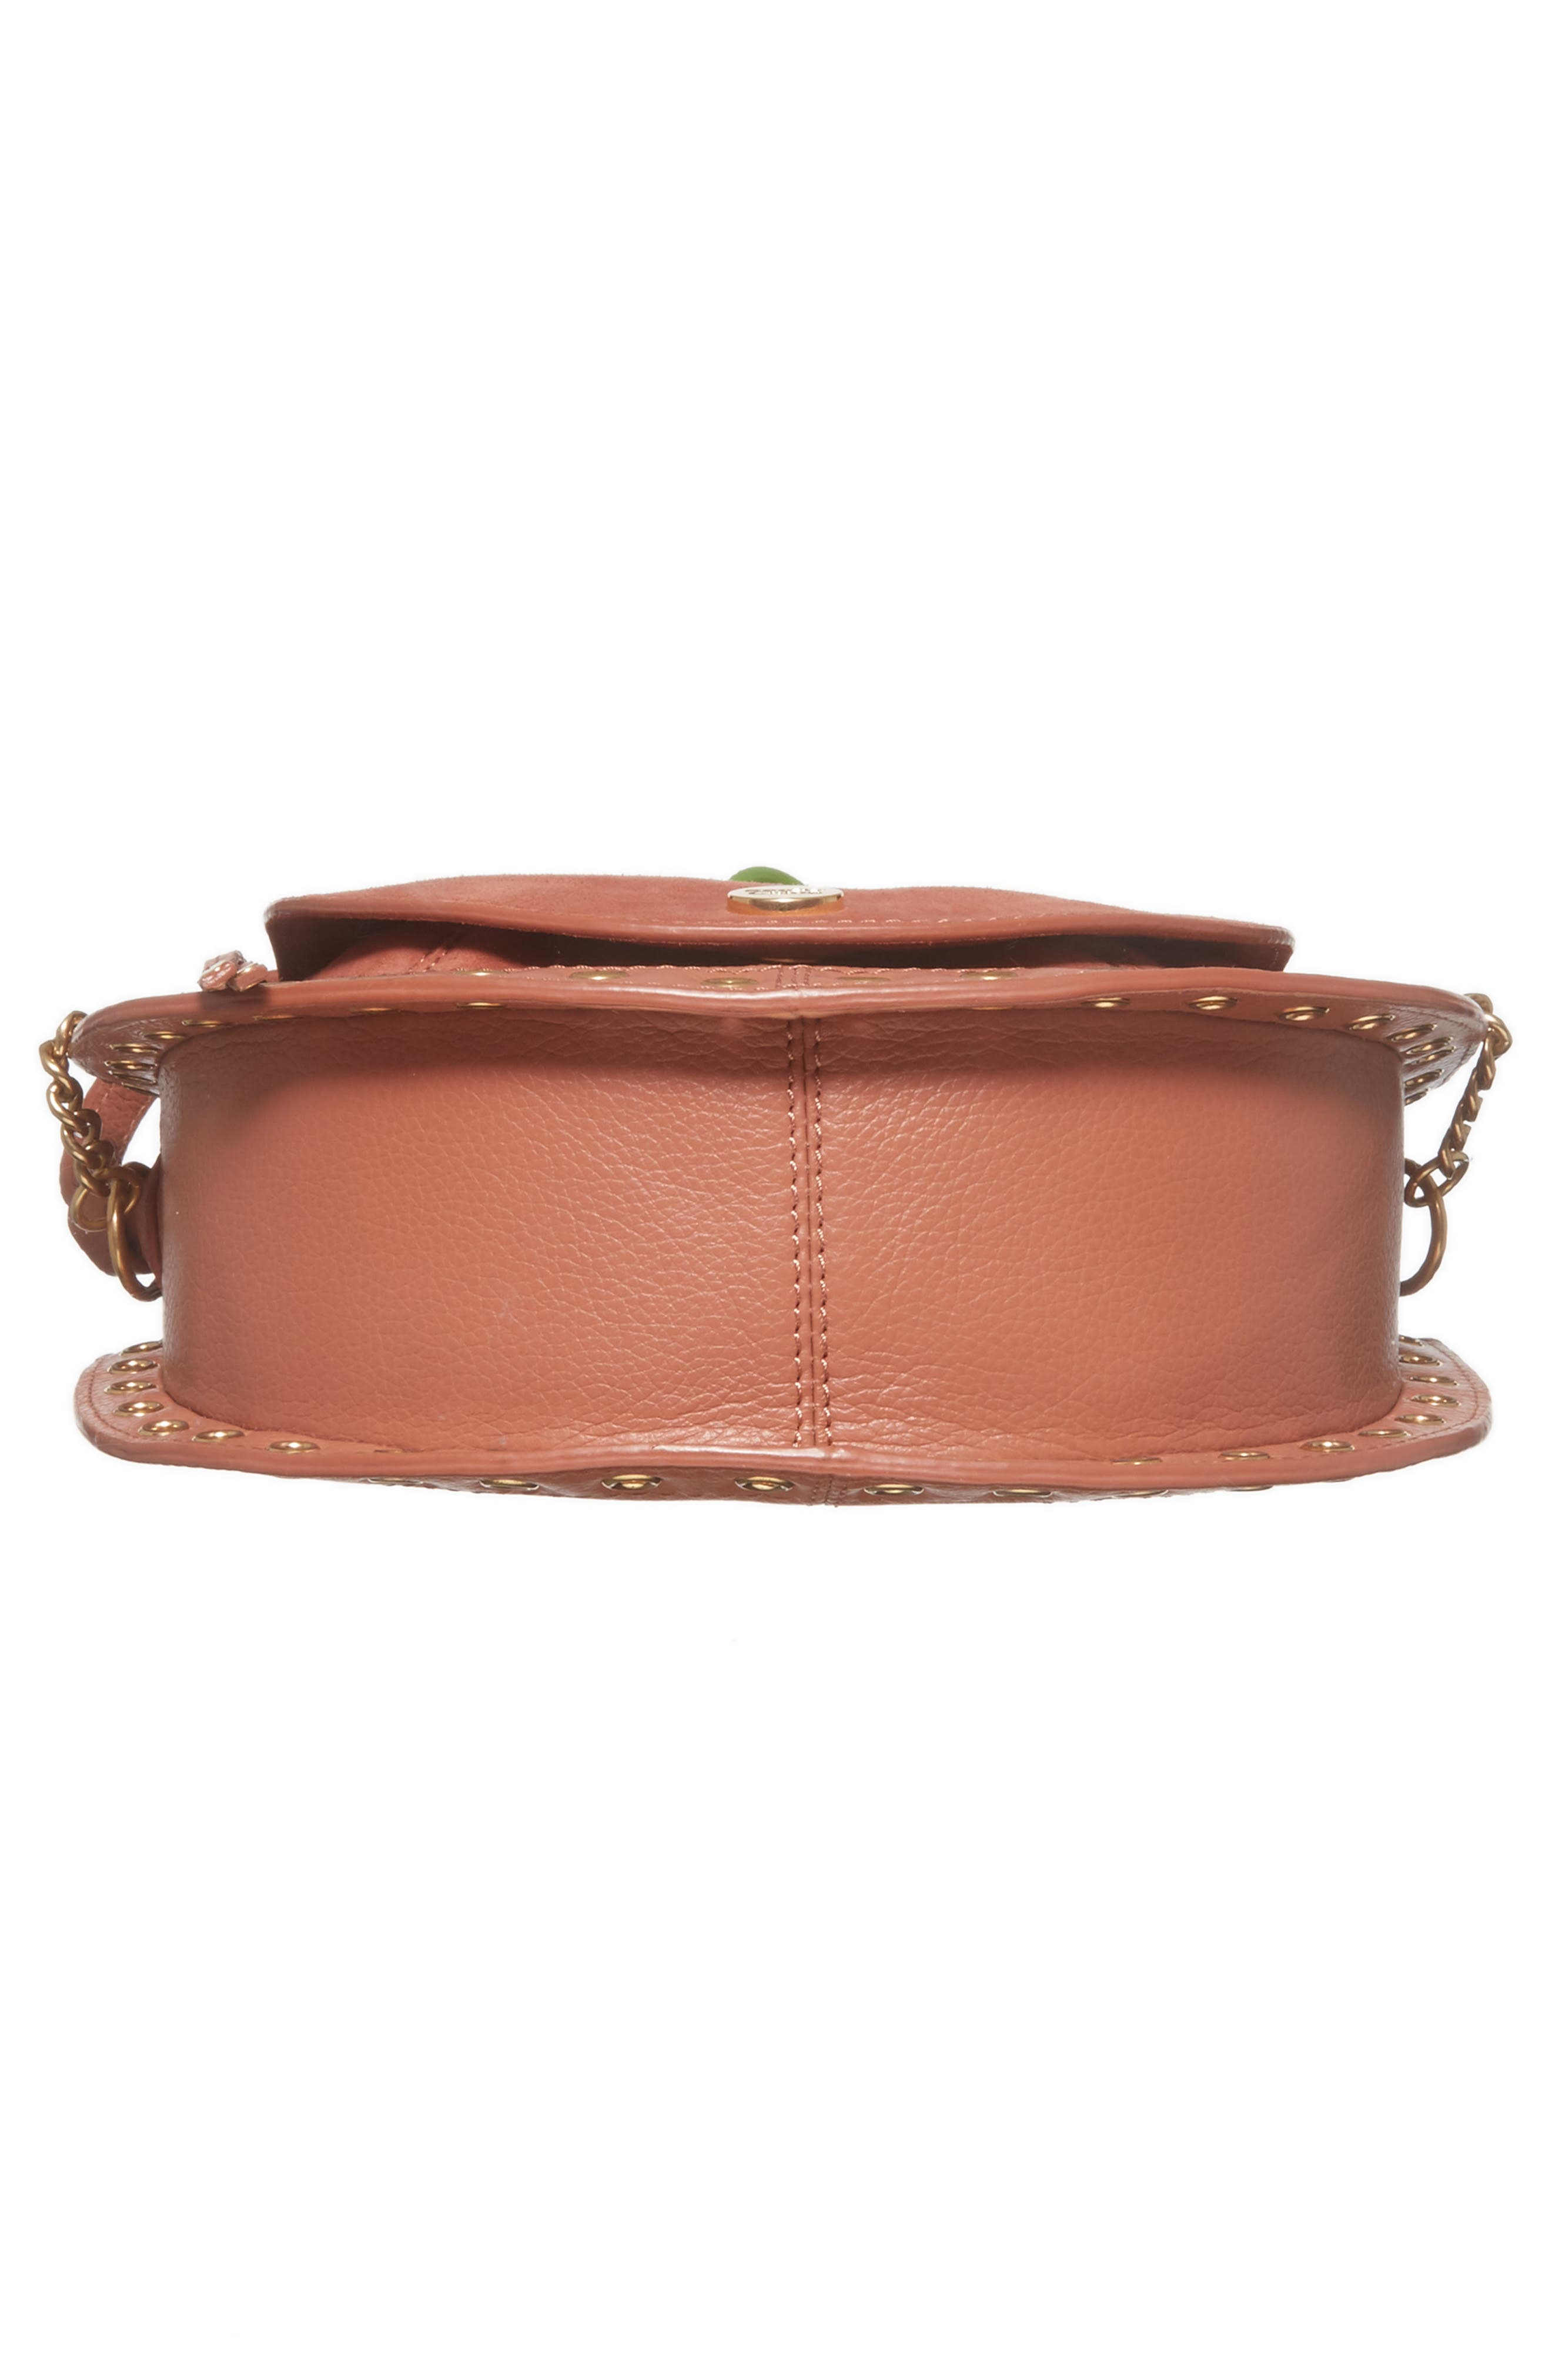 Kriss Leather & Suede Grommet Shoulder Bag,                             Alternate thumbnail 6, color,                             Cheek